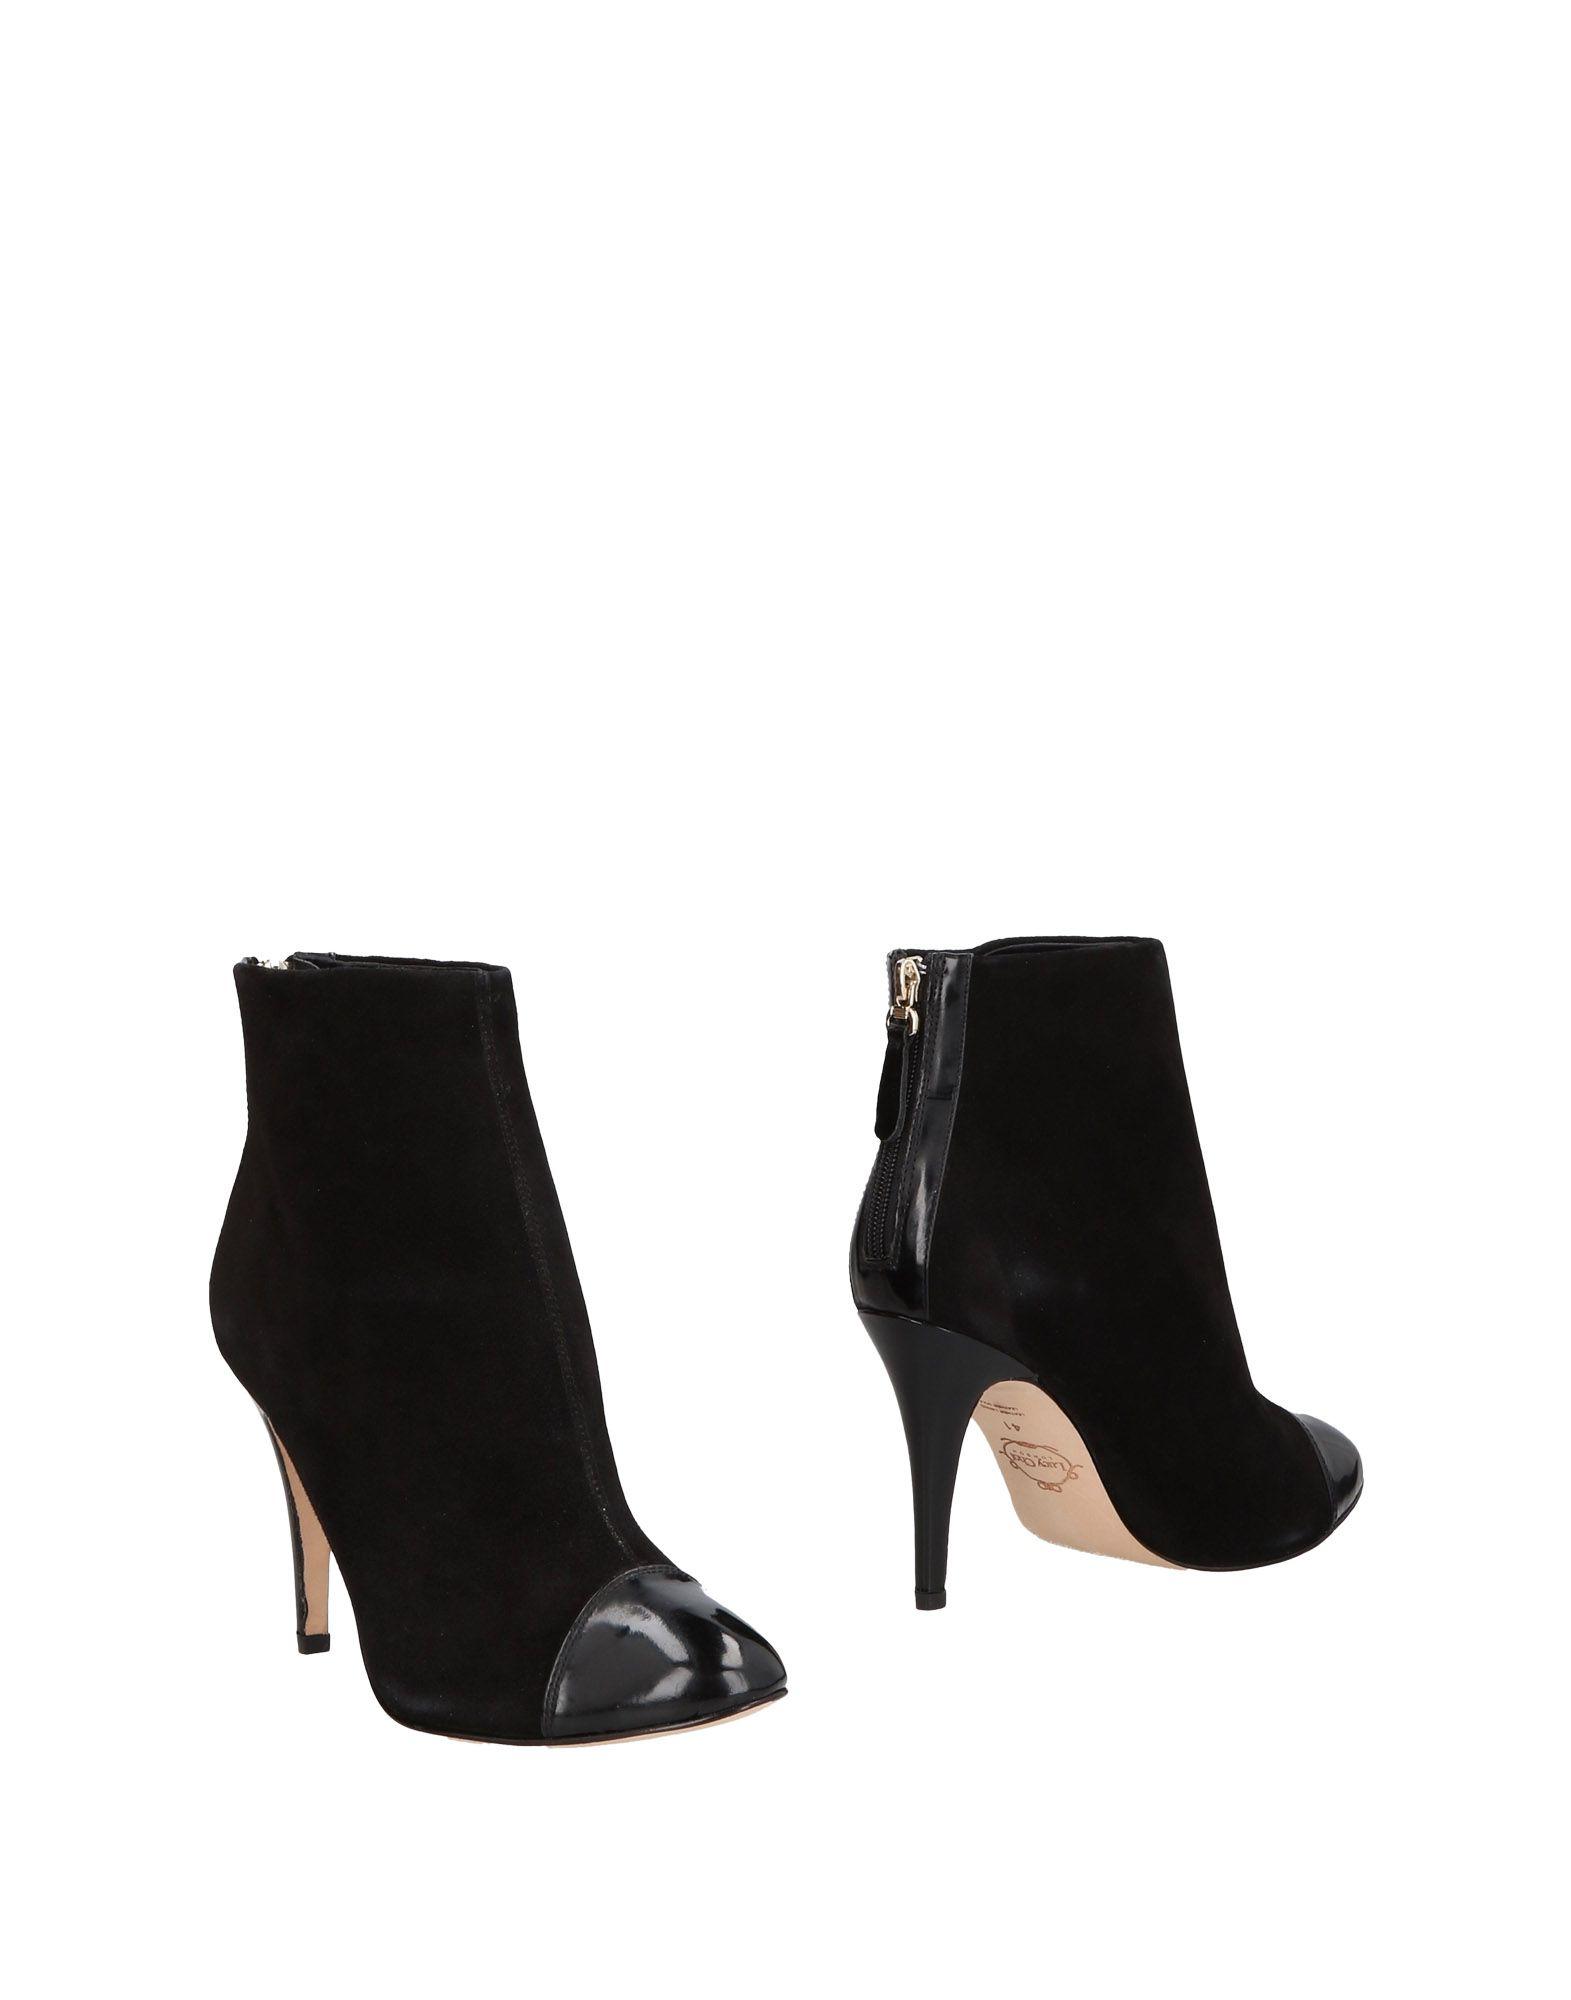 LUCY CHOI London Полусапоги и высокие ботинки lucy spraggan london